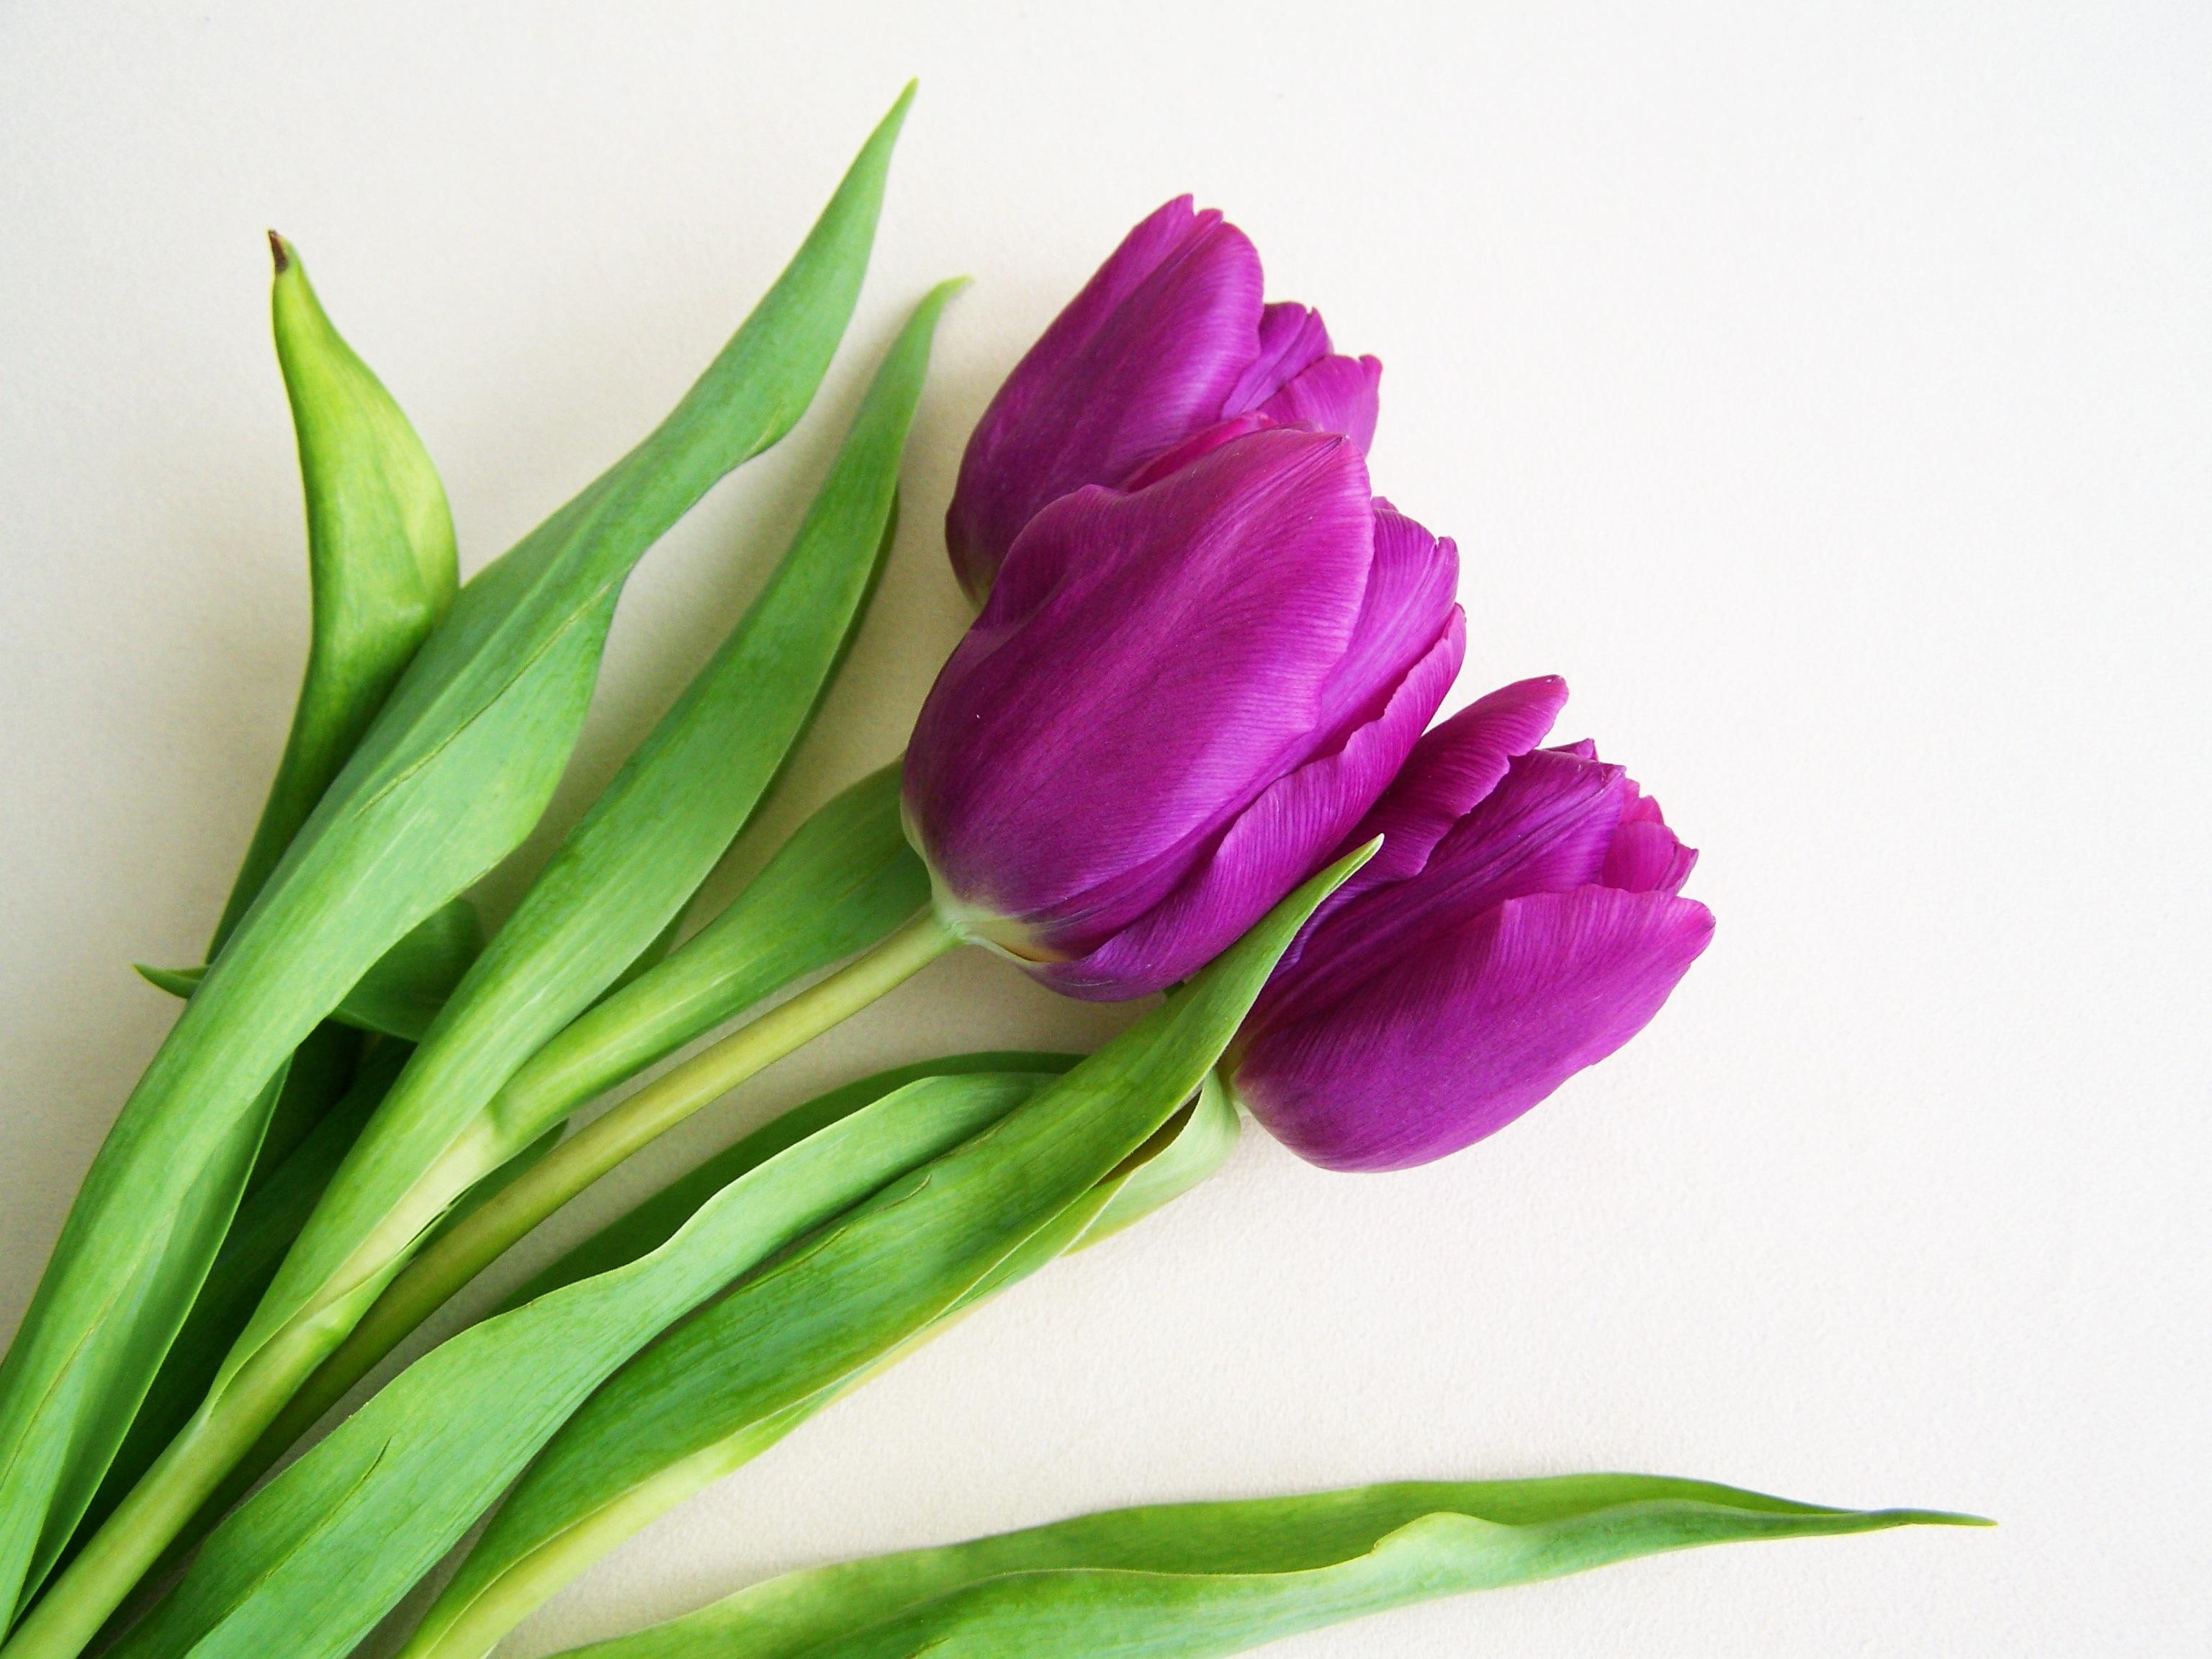 Free Images Petal Tulip Flora Spring Flower Flowering Plant